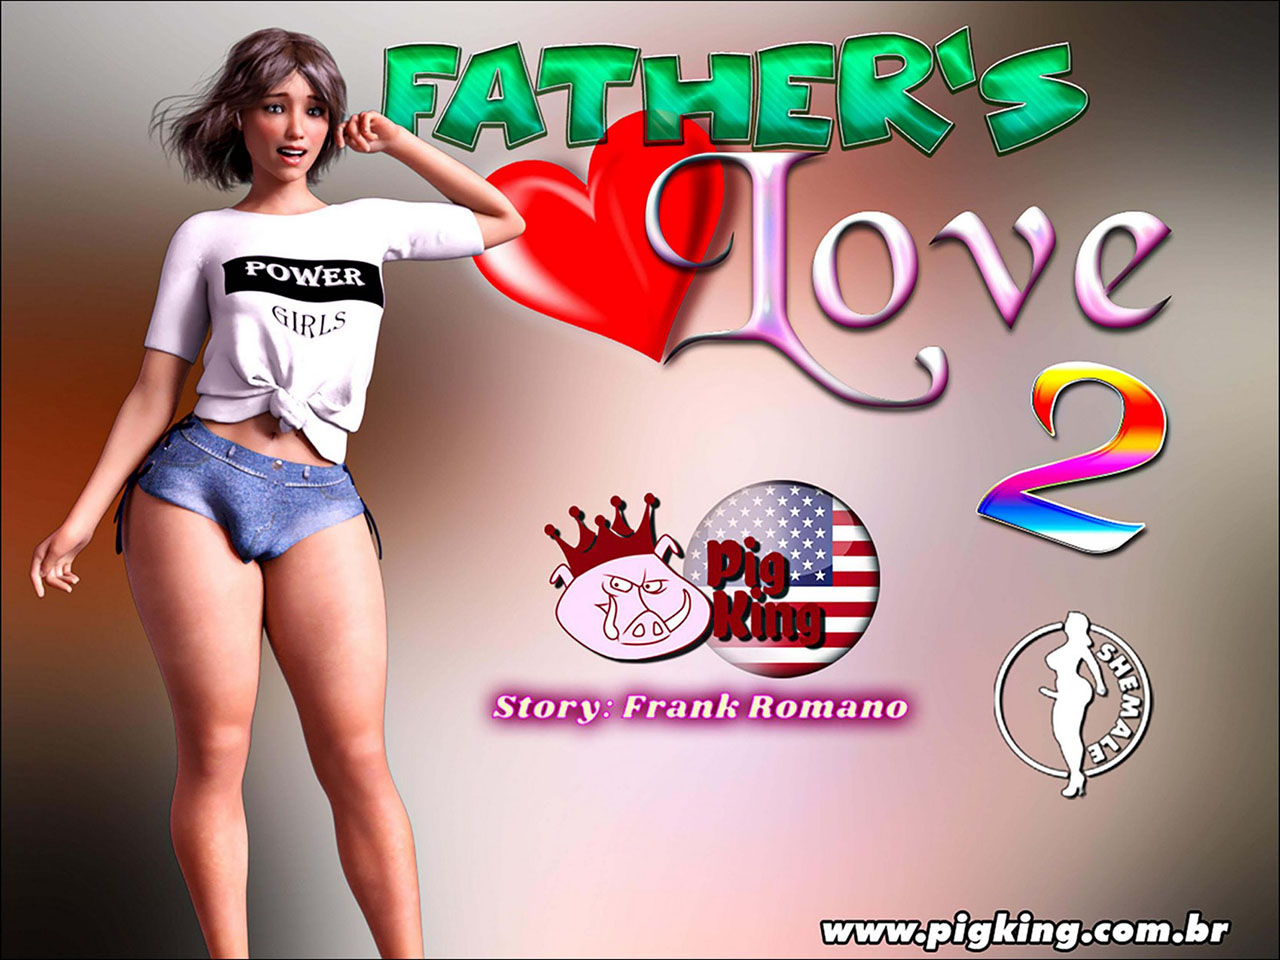 FATHERS LOVE parte 2